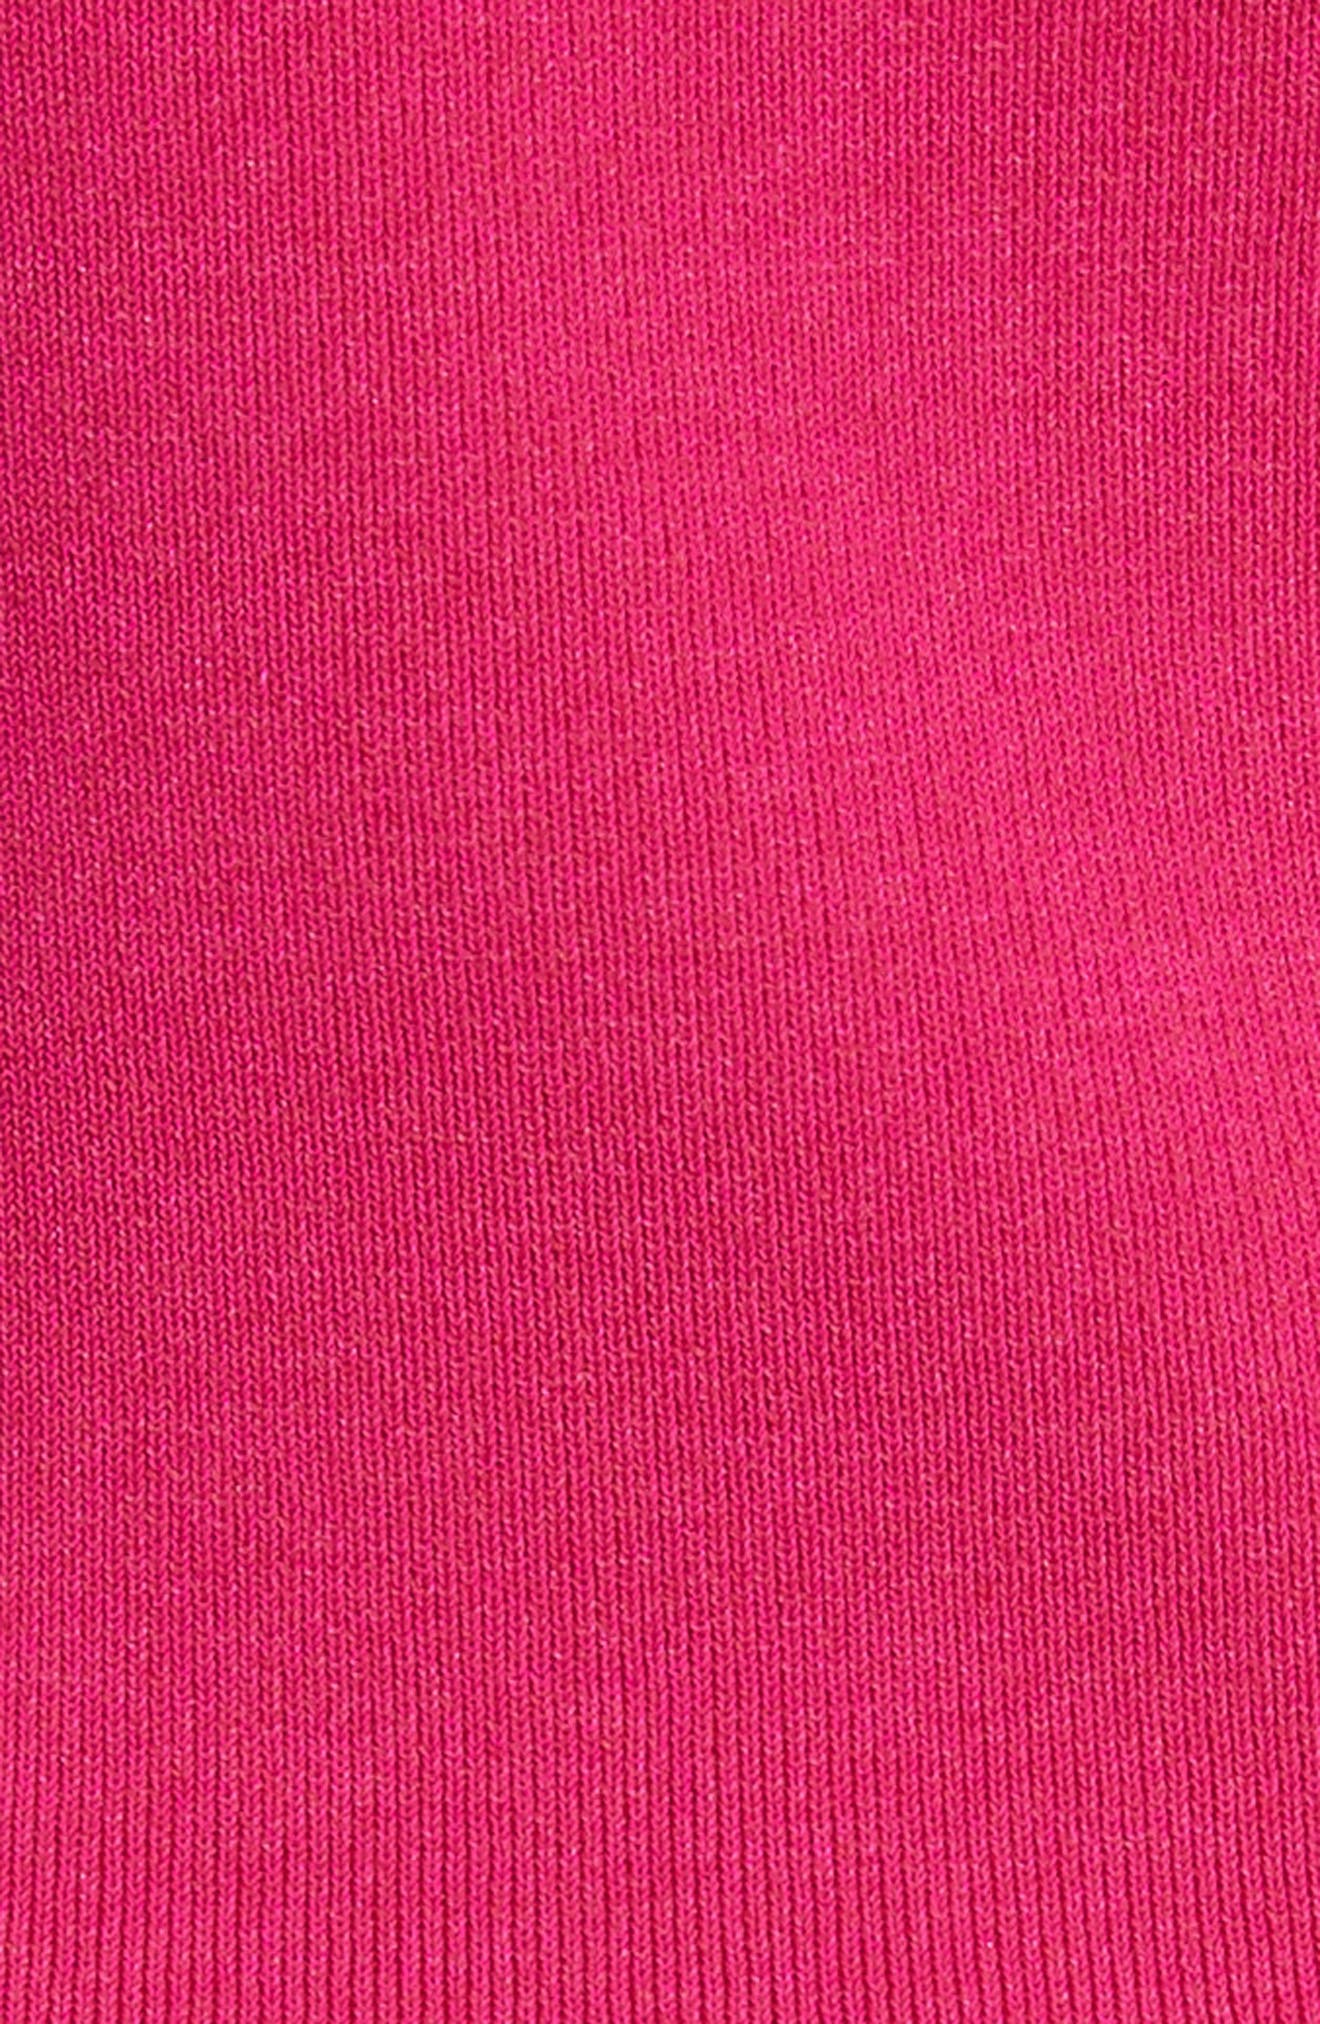 Alternate Image 5  - Proenza Schouler Knit Top